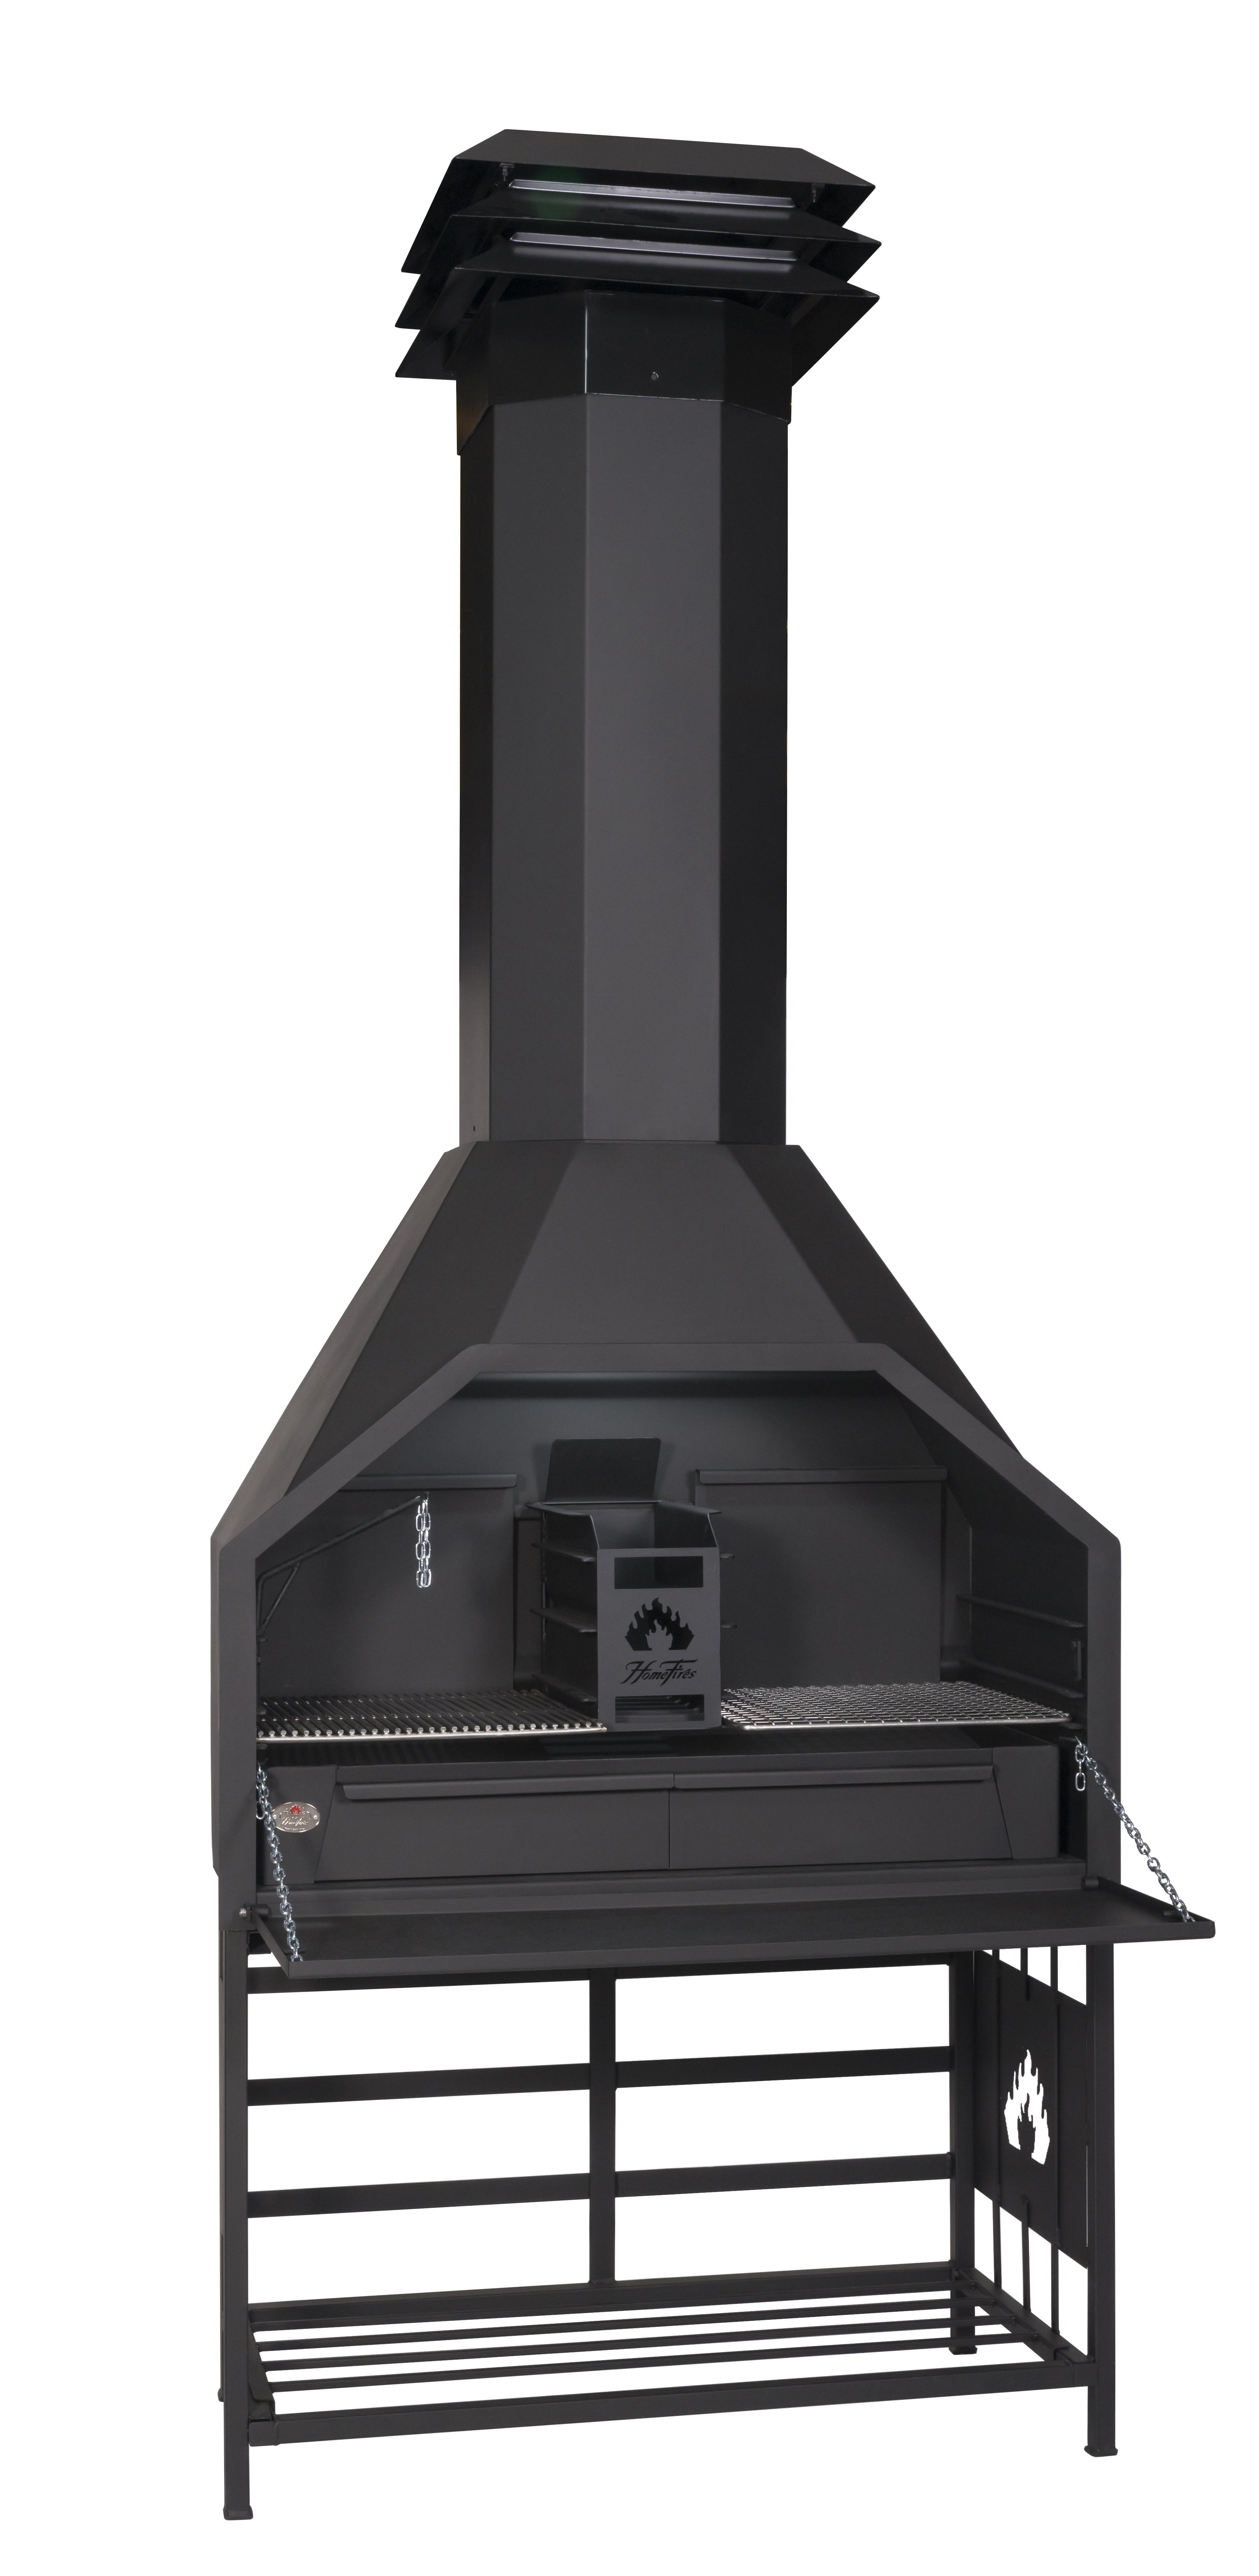 HomeFires Freistehender Grillkamin/Braai, Modell 1200 inkl. Holzlager/Untergestell